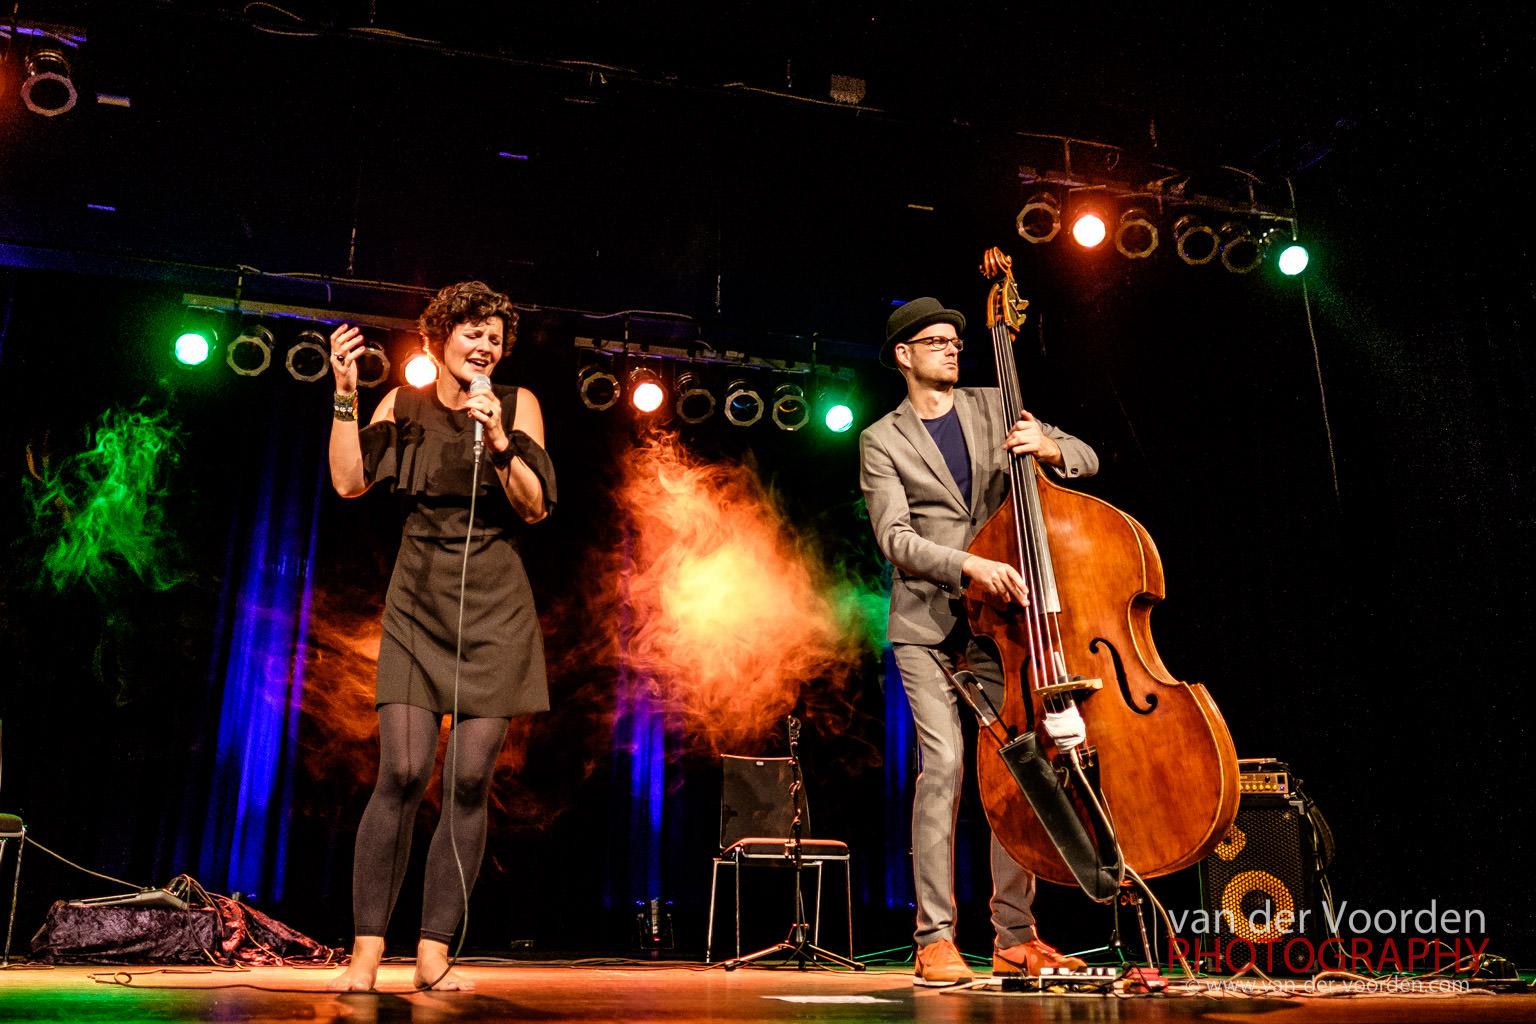 2015 Le Bang Bang meets Café del Mundo @ Stadthalle Buchenwww